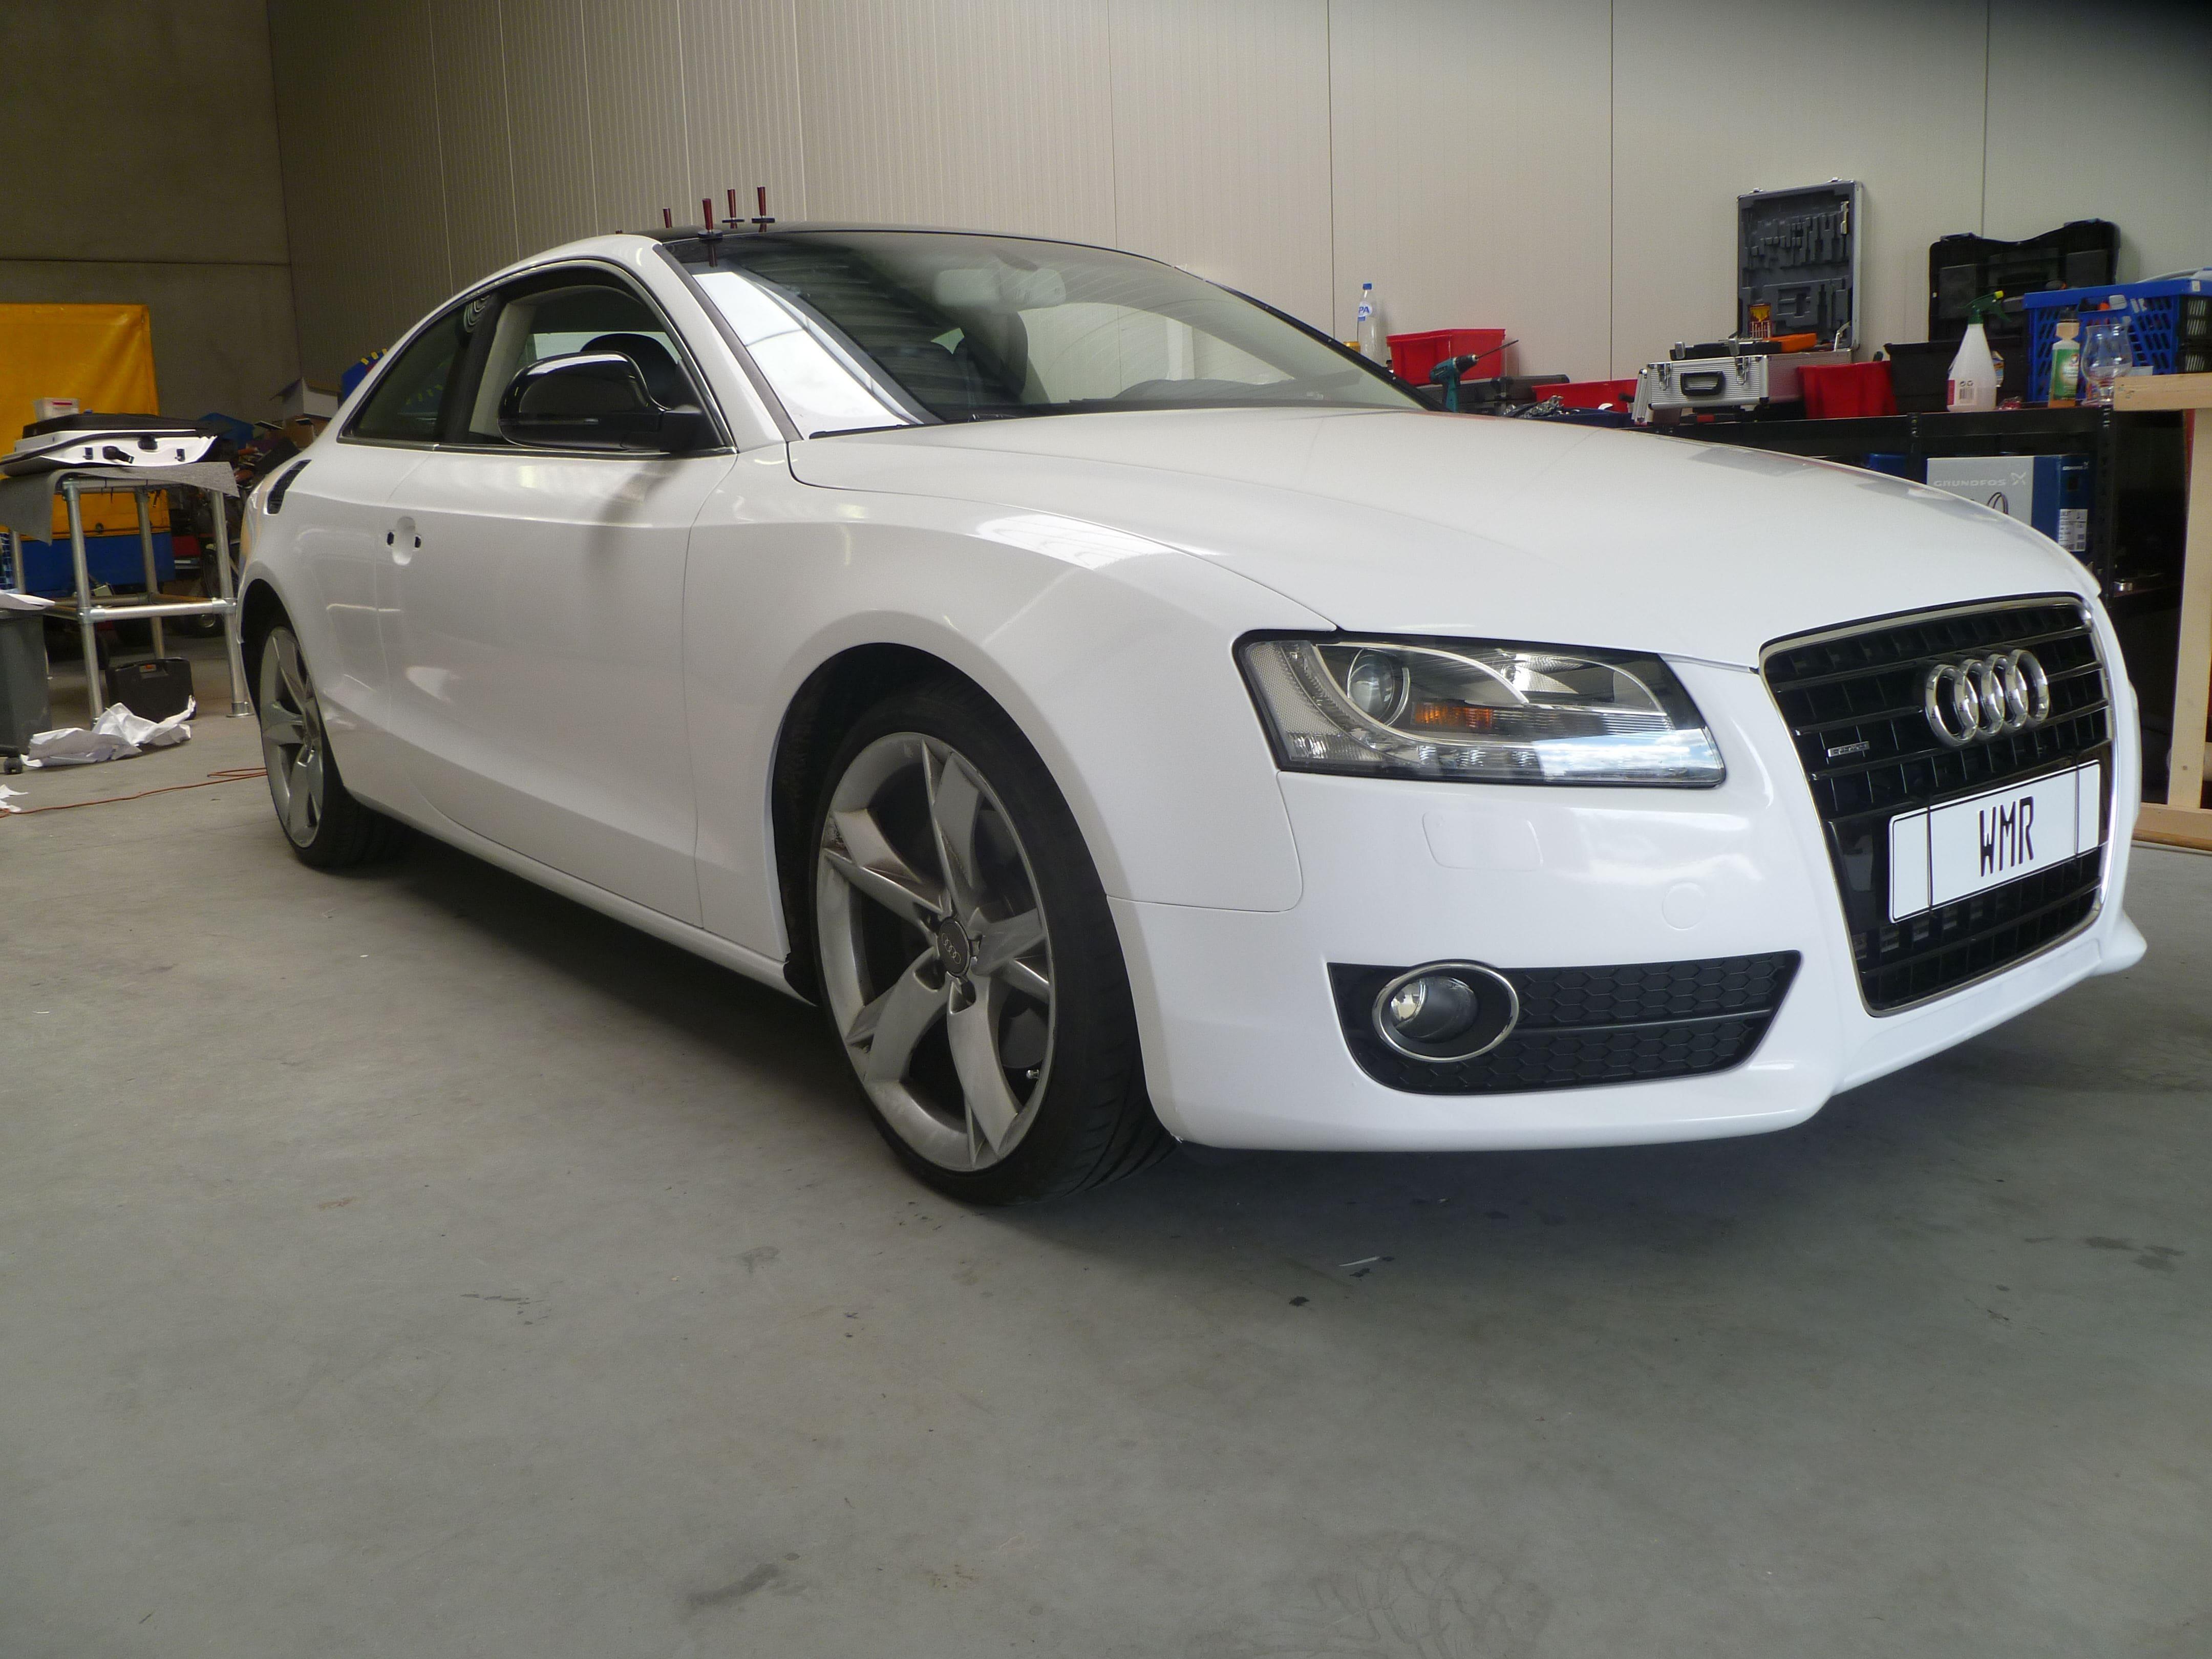 Audi A5 coupe met Metallic Witte Wrap, Carwrapping door Wrapmyride.nu Foto-nr:4725, ©2021